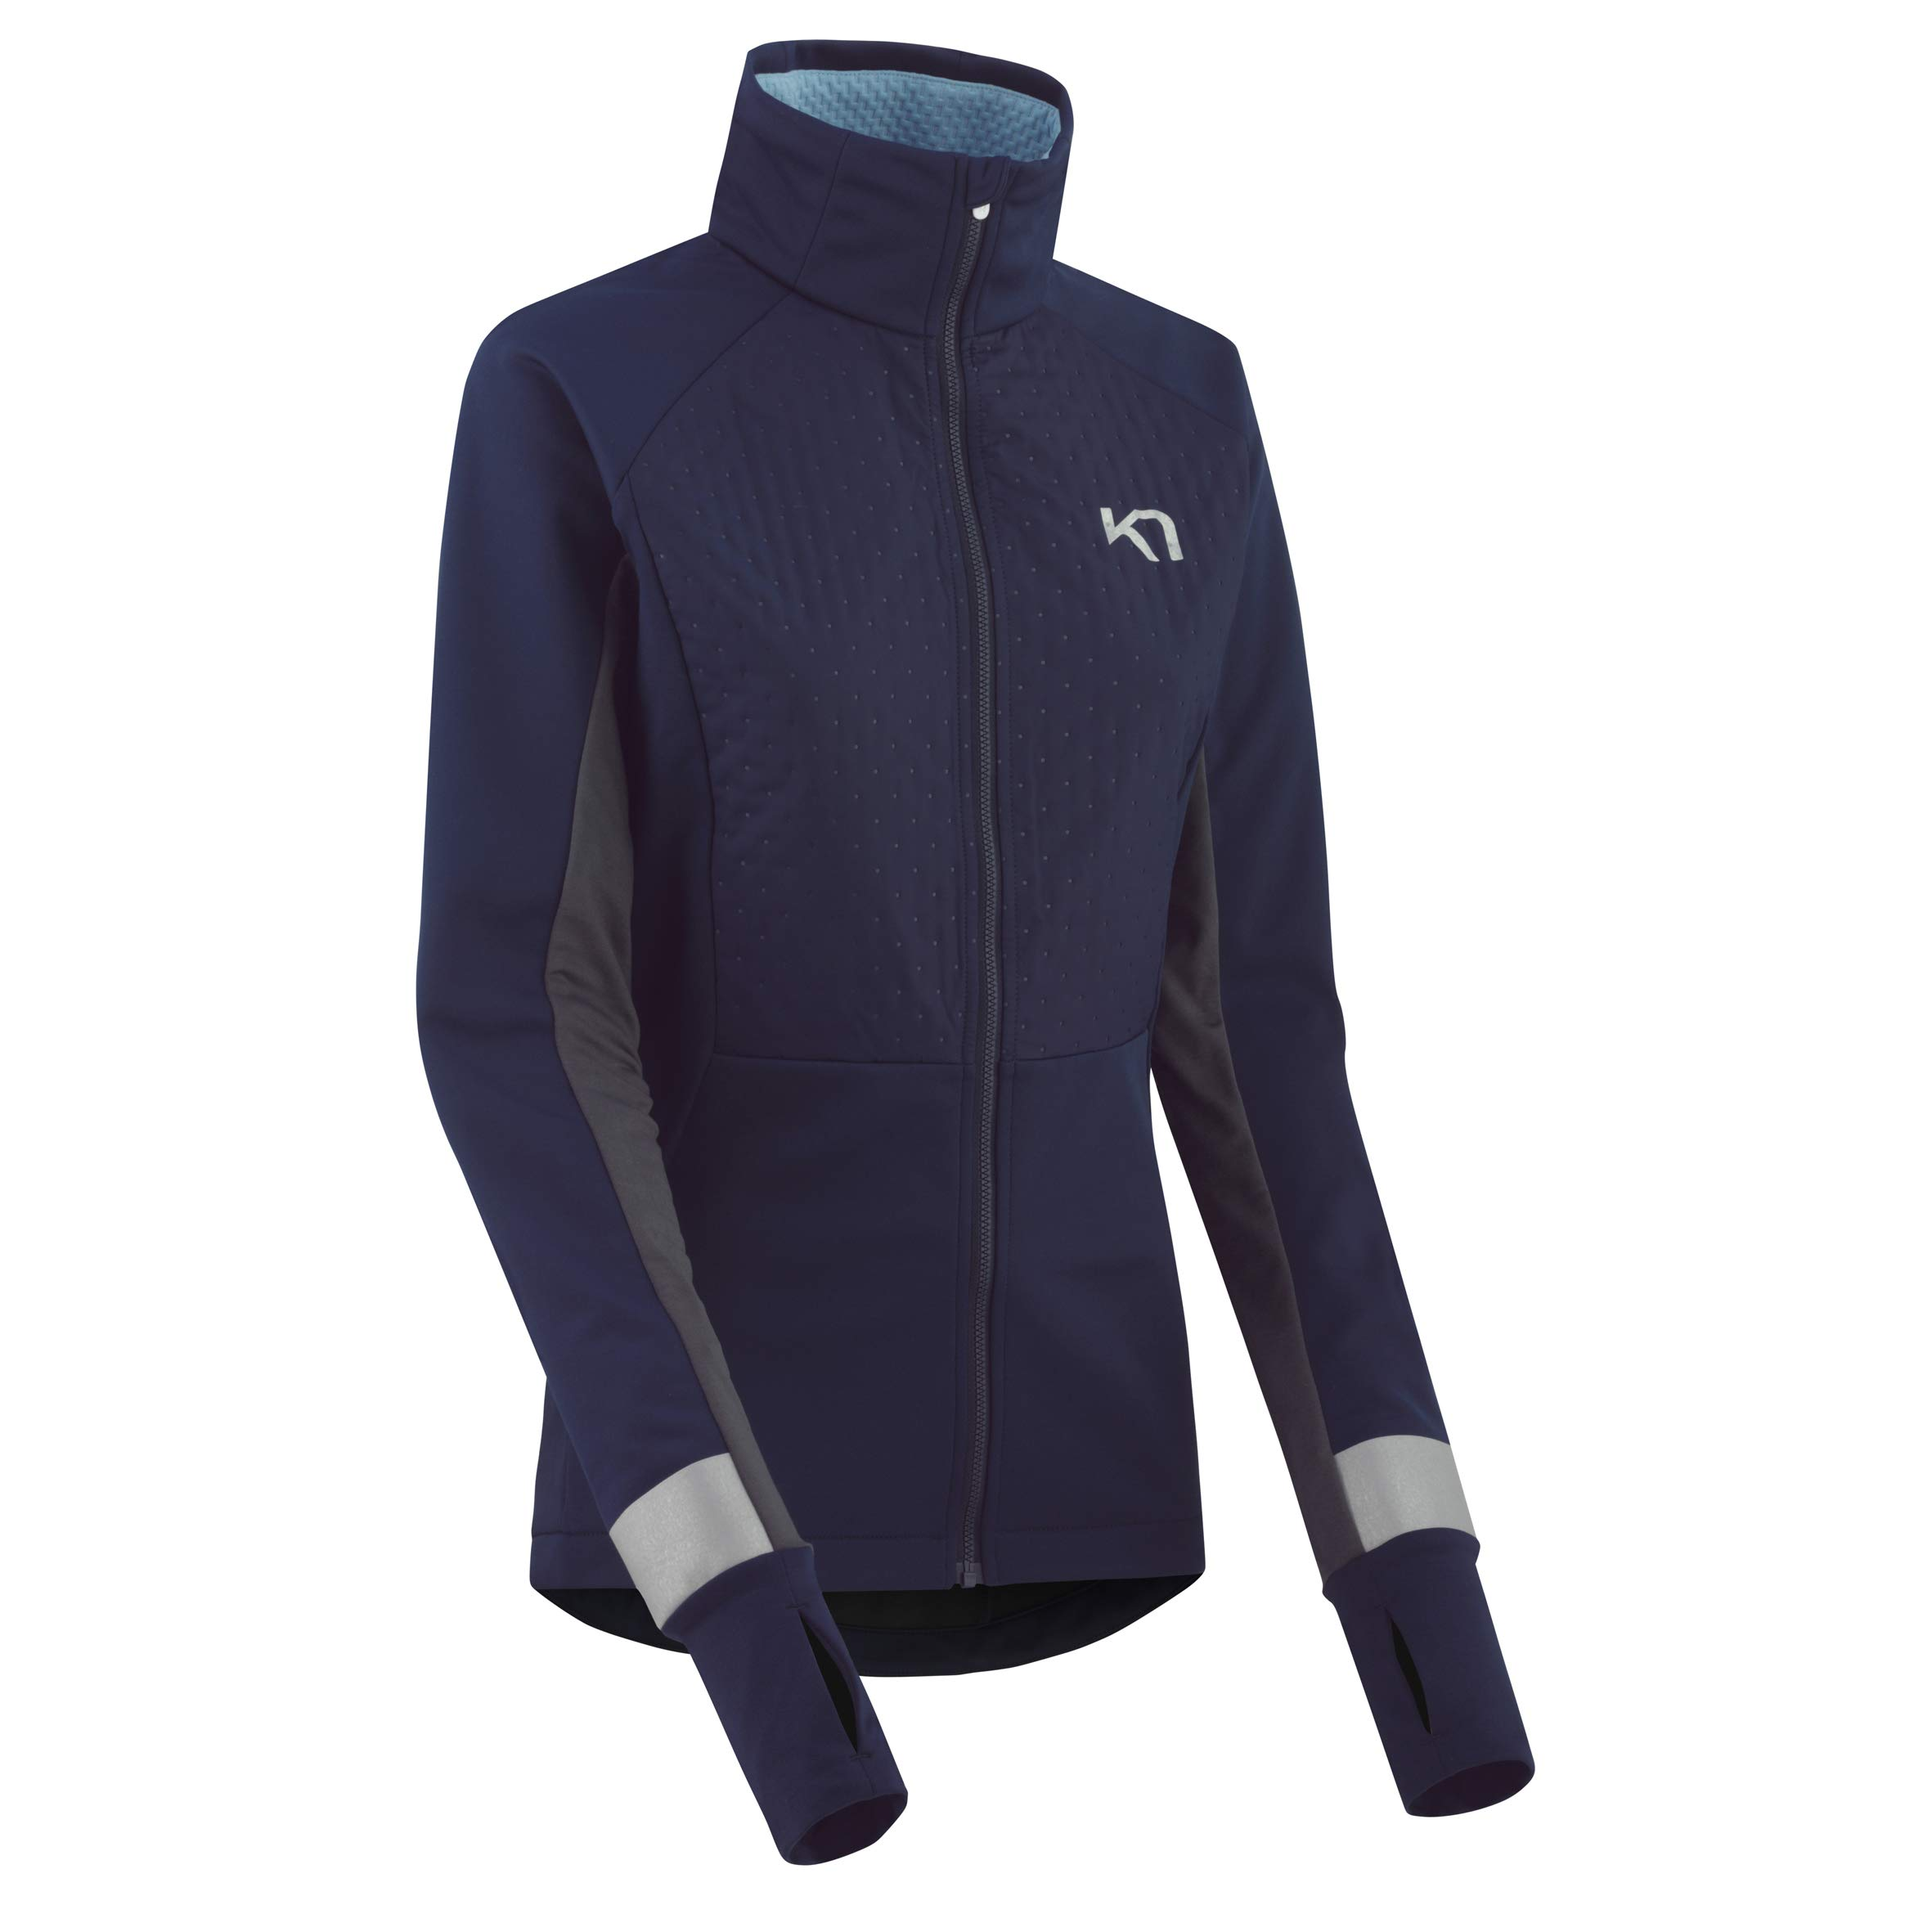 Kari Traa Women's Toril Jacket - Water-Resistant Athletic Coat